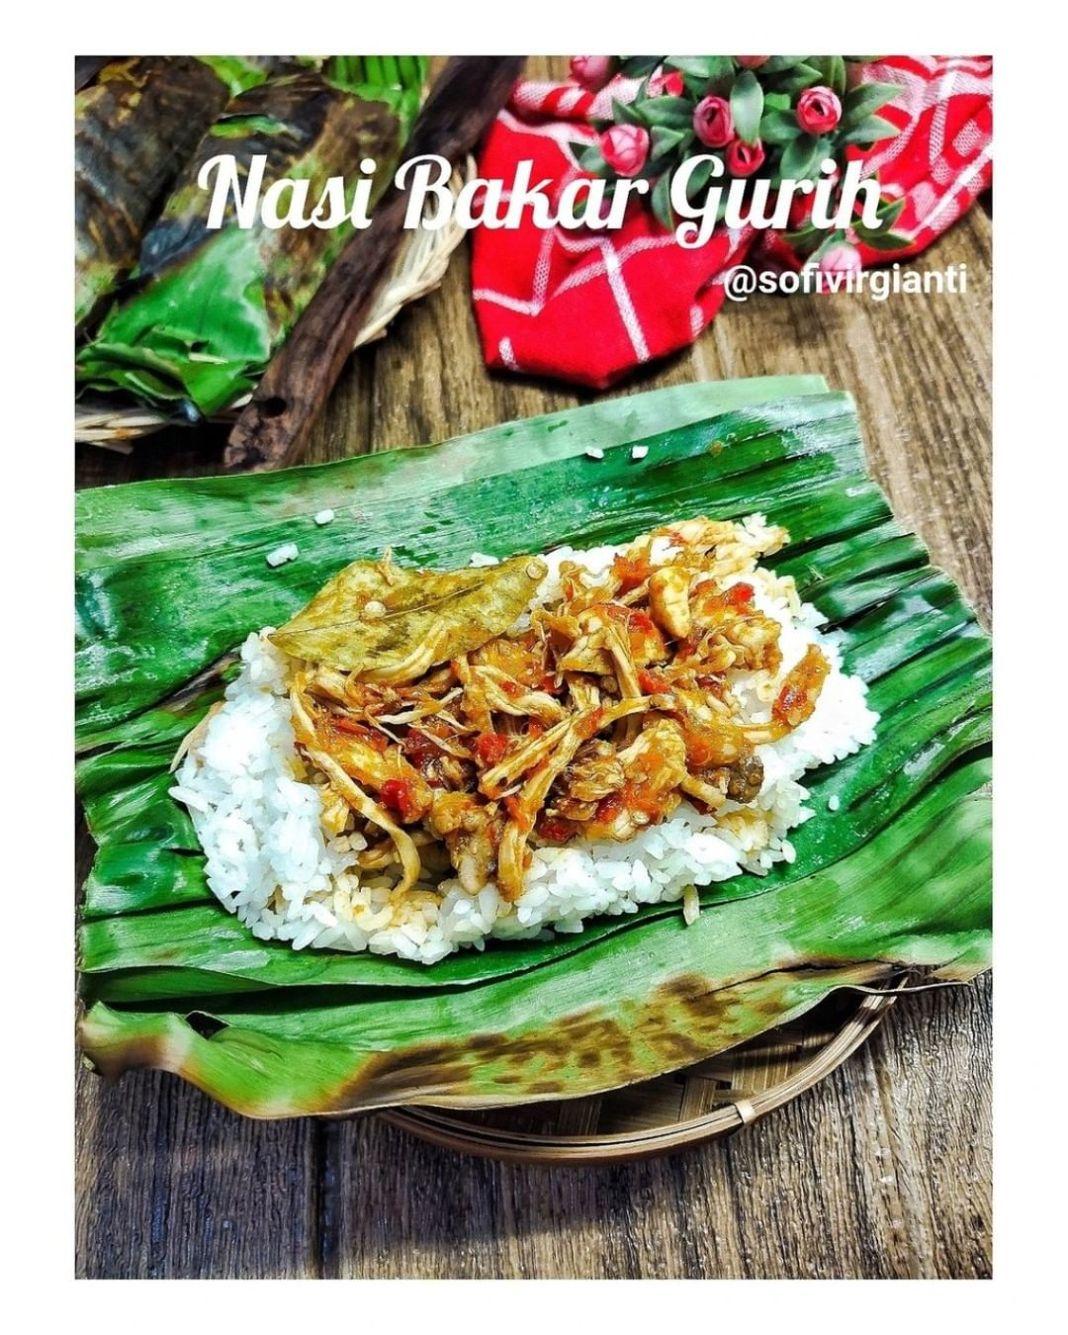 Info kuliner, Siapa suka nasi bakar??  NASI BAKAR GURIH @sofivirgianti  Bahan : 500 gr Beras putih. 1 ltr San…